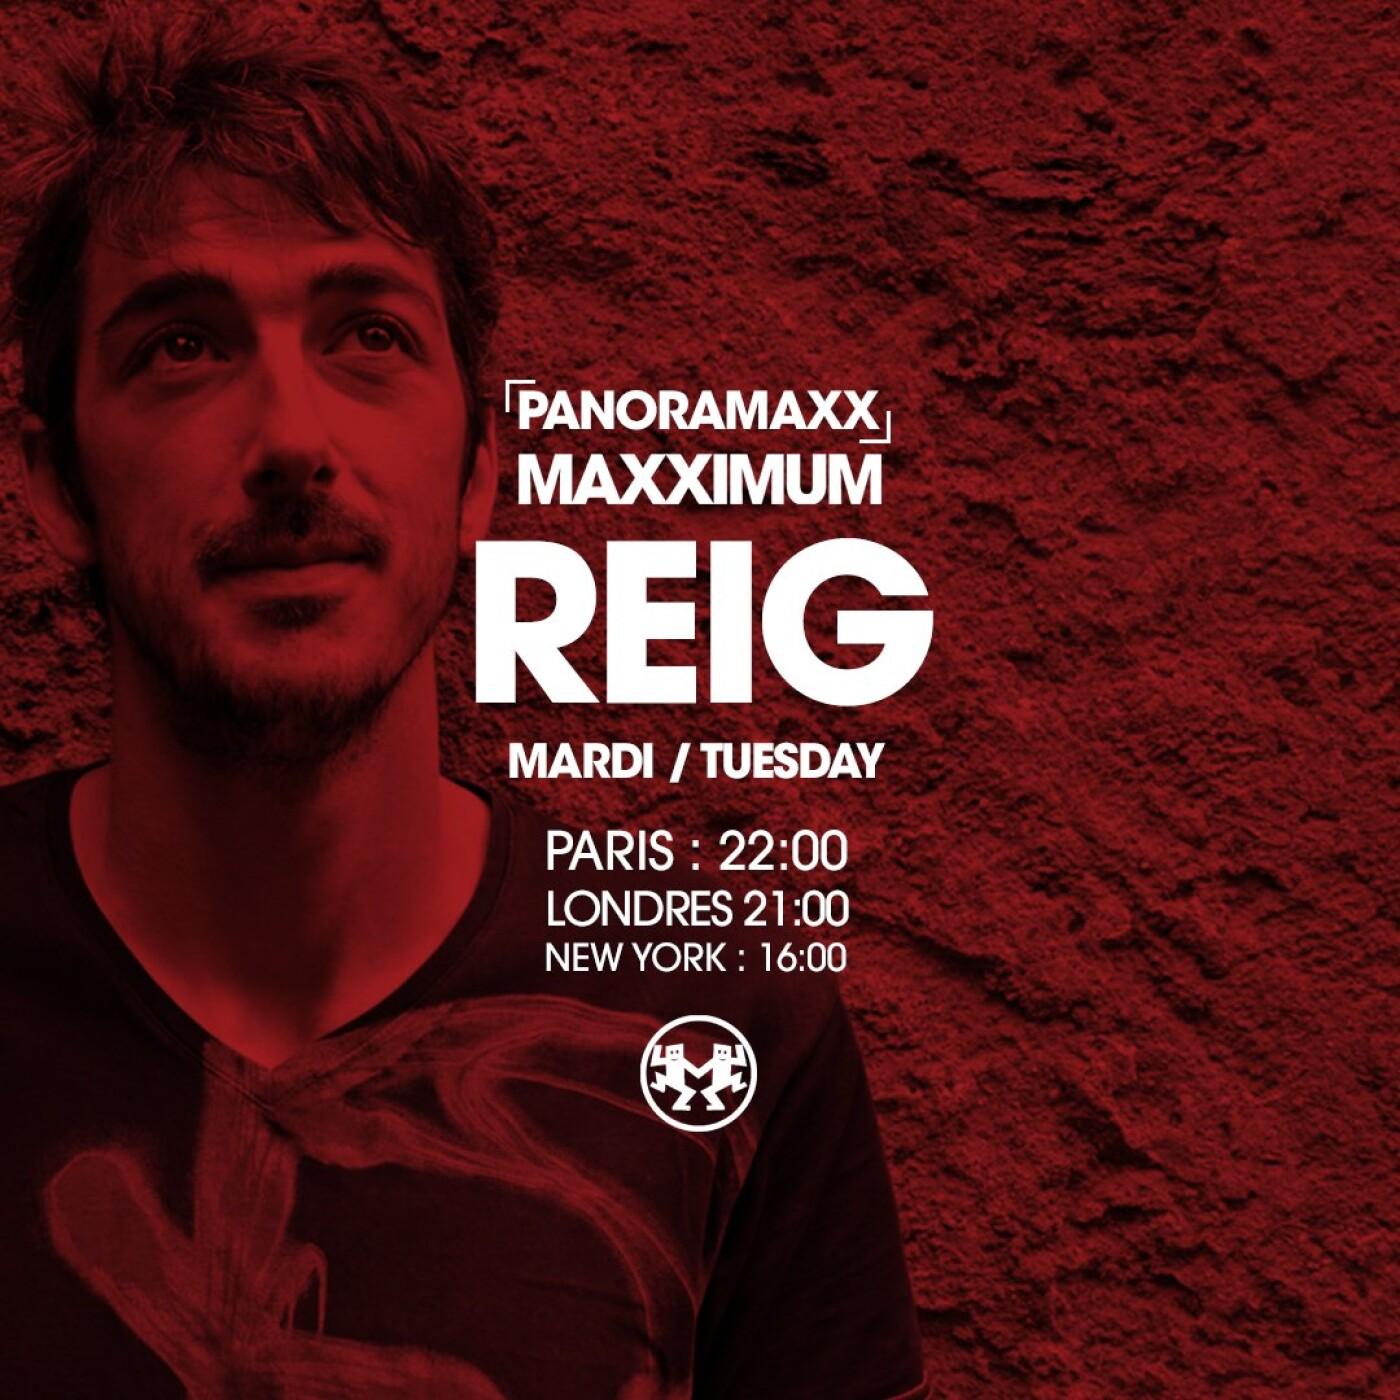 PANORAMAXX : REIG